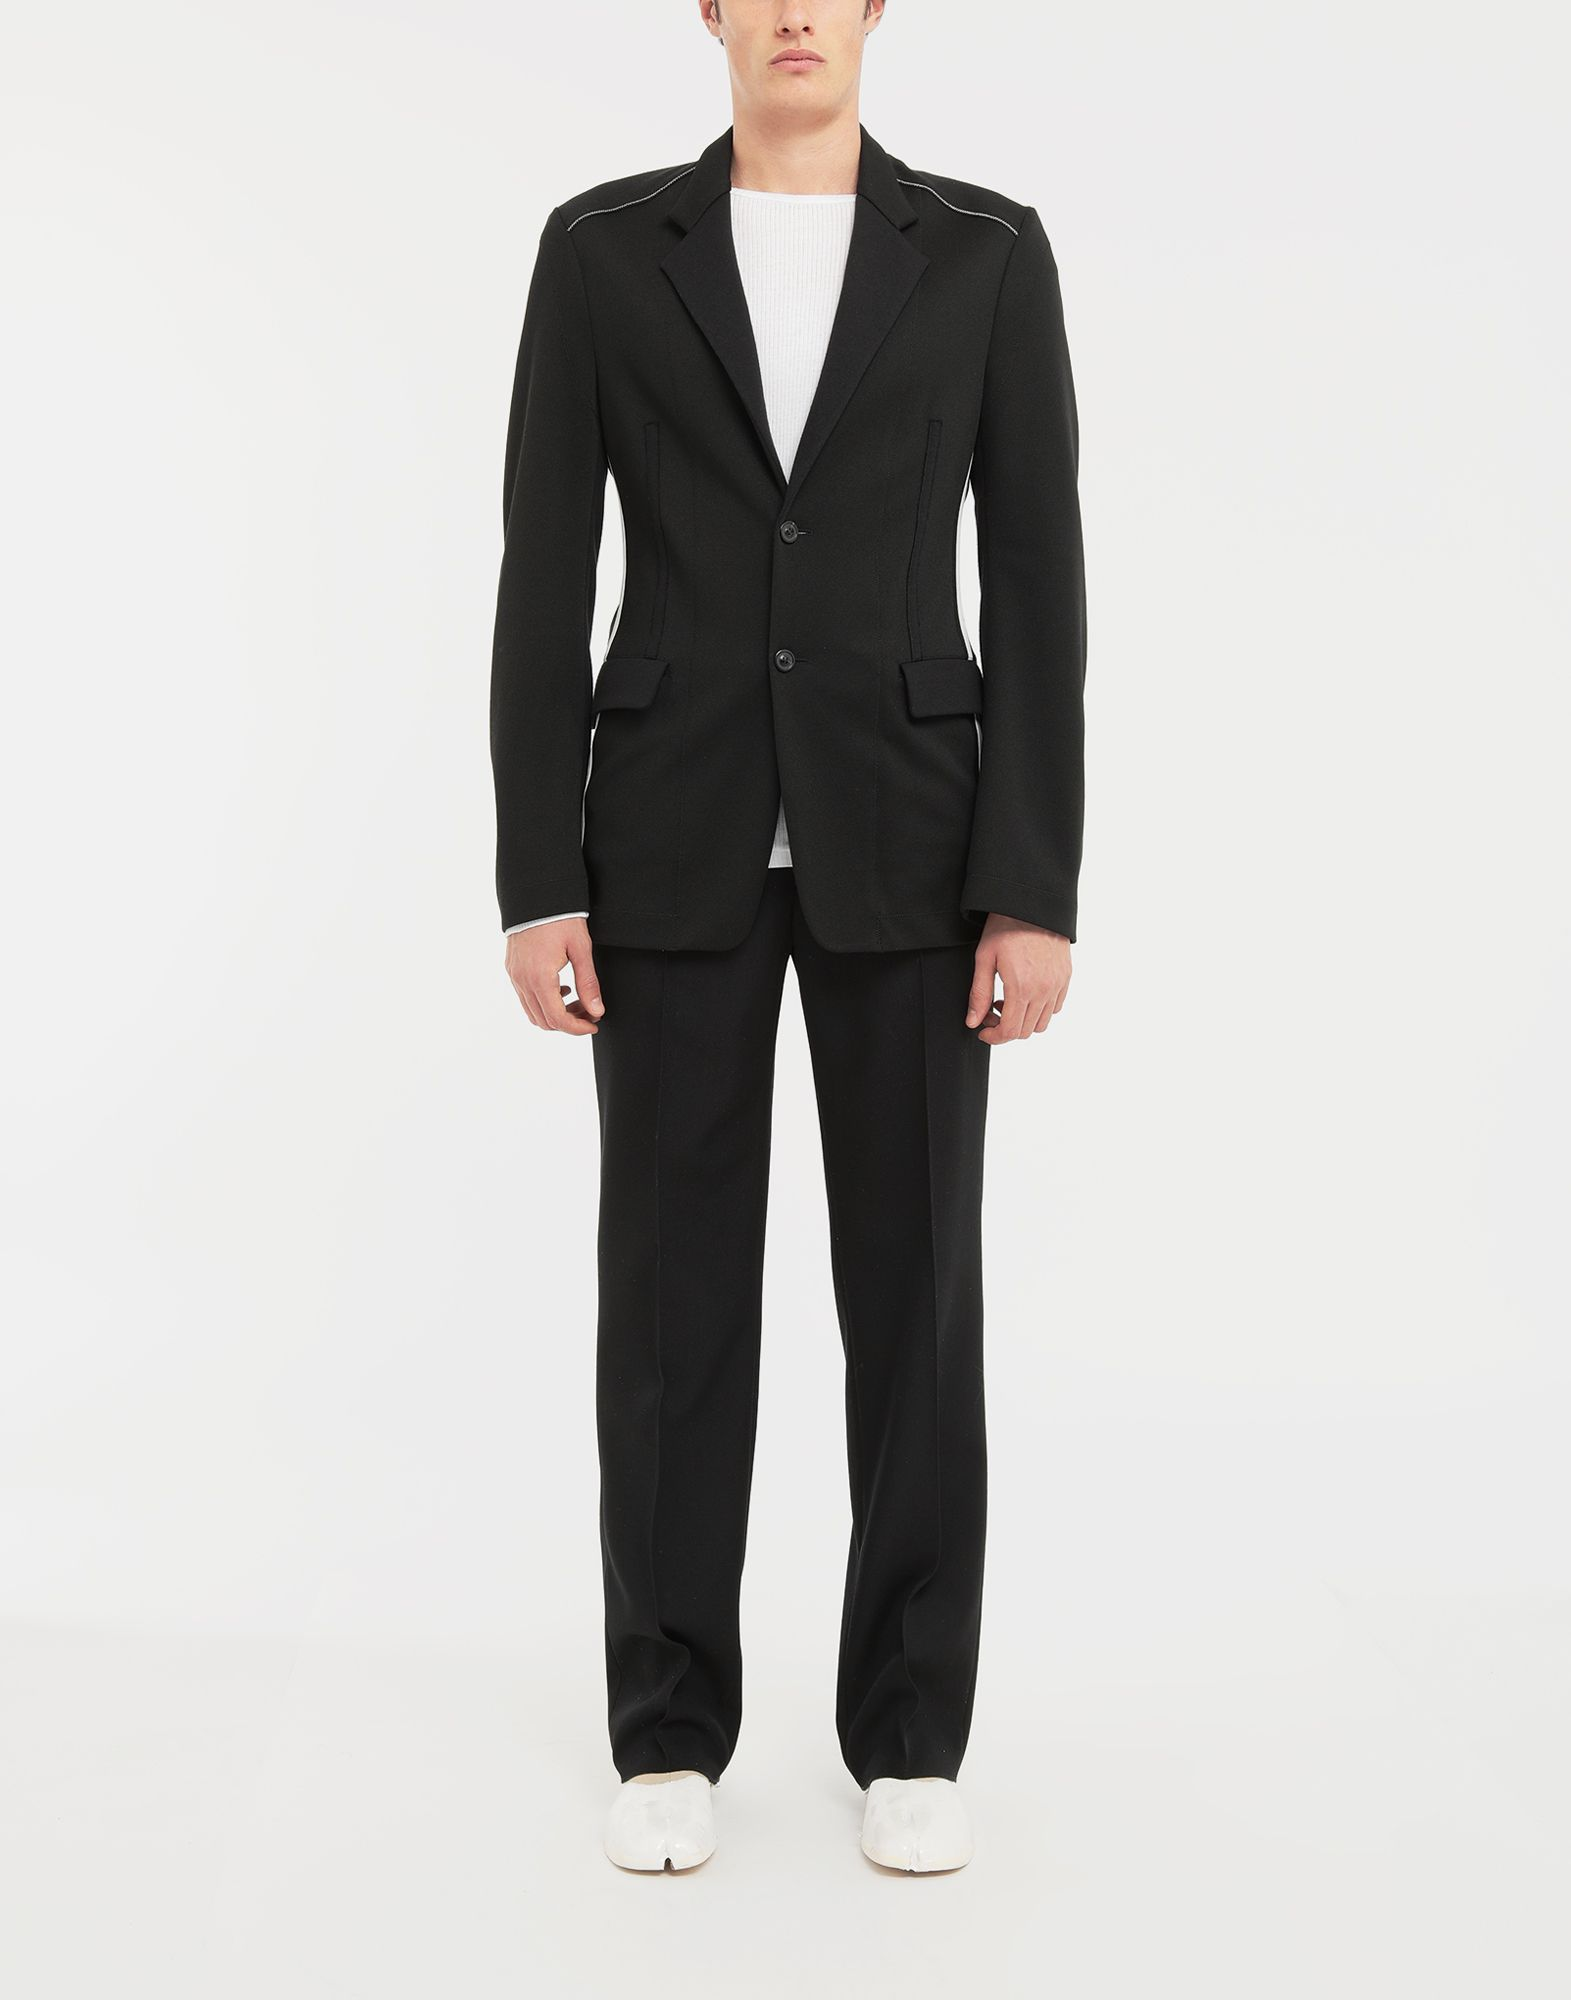 MAISON MARGIELA Exposed seam jersey jacket Blazer Man d